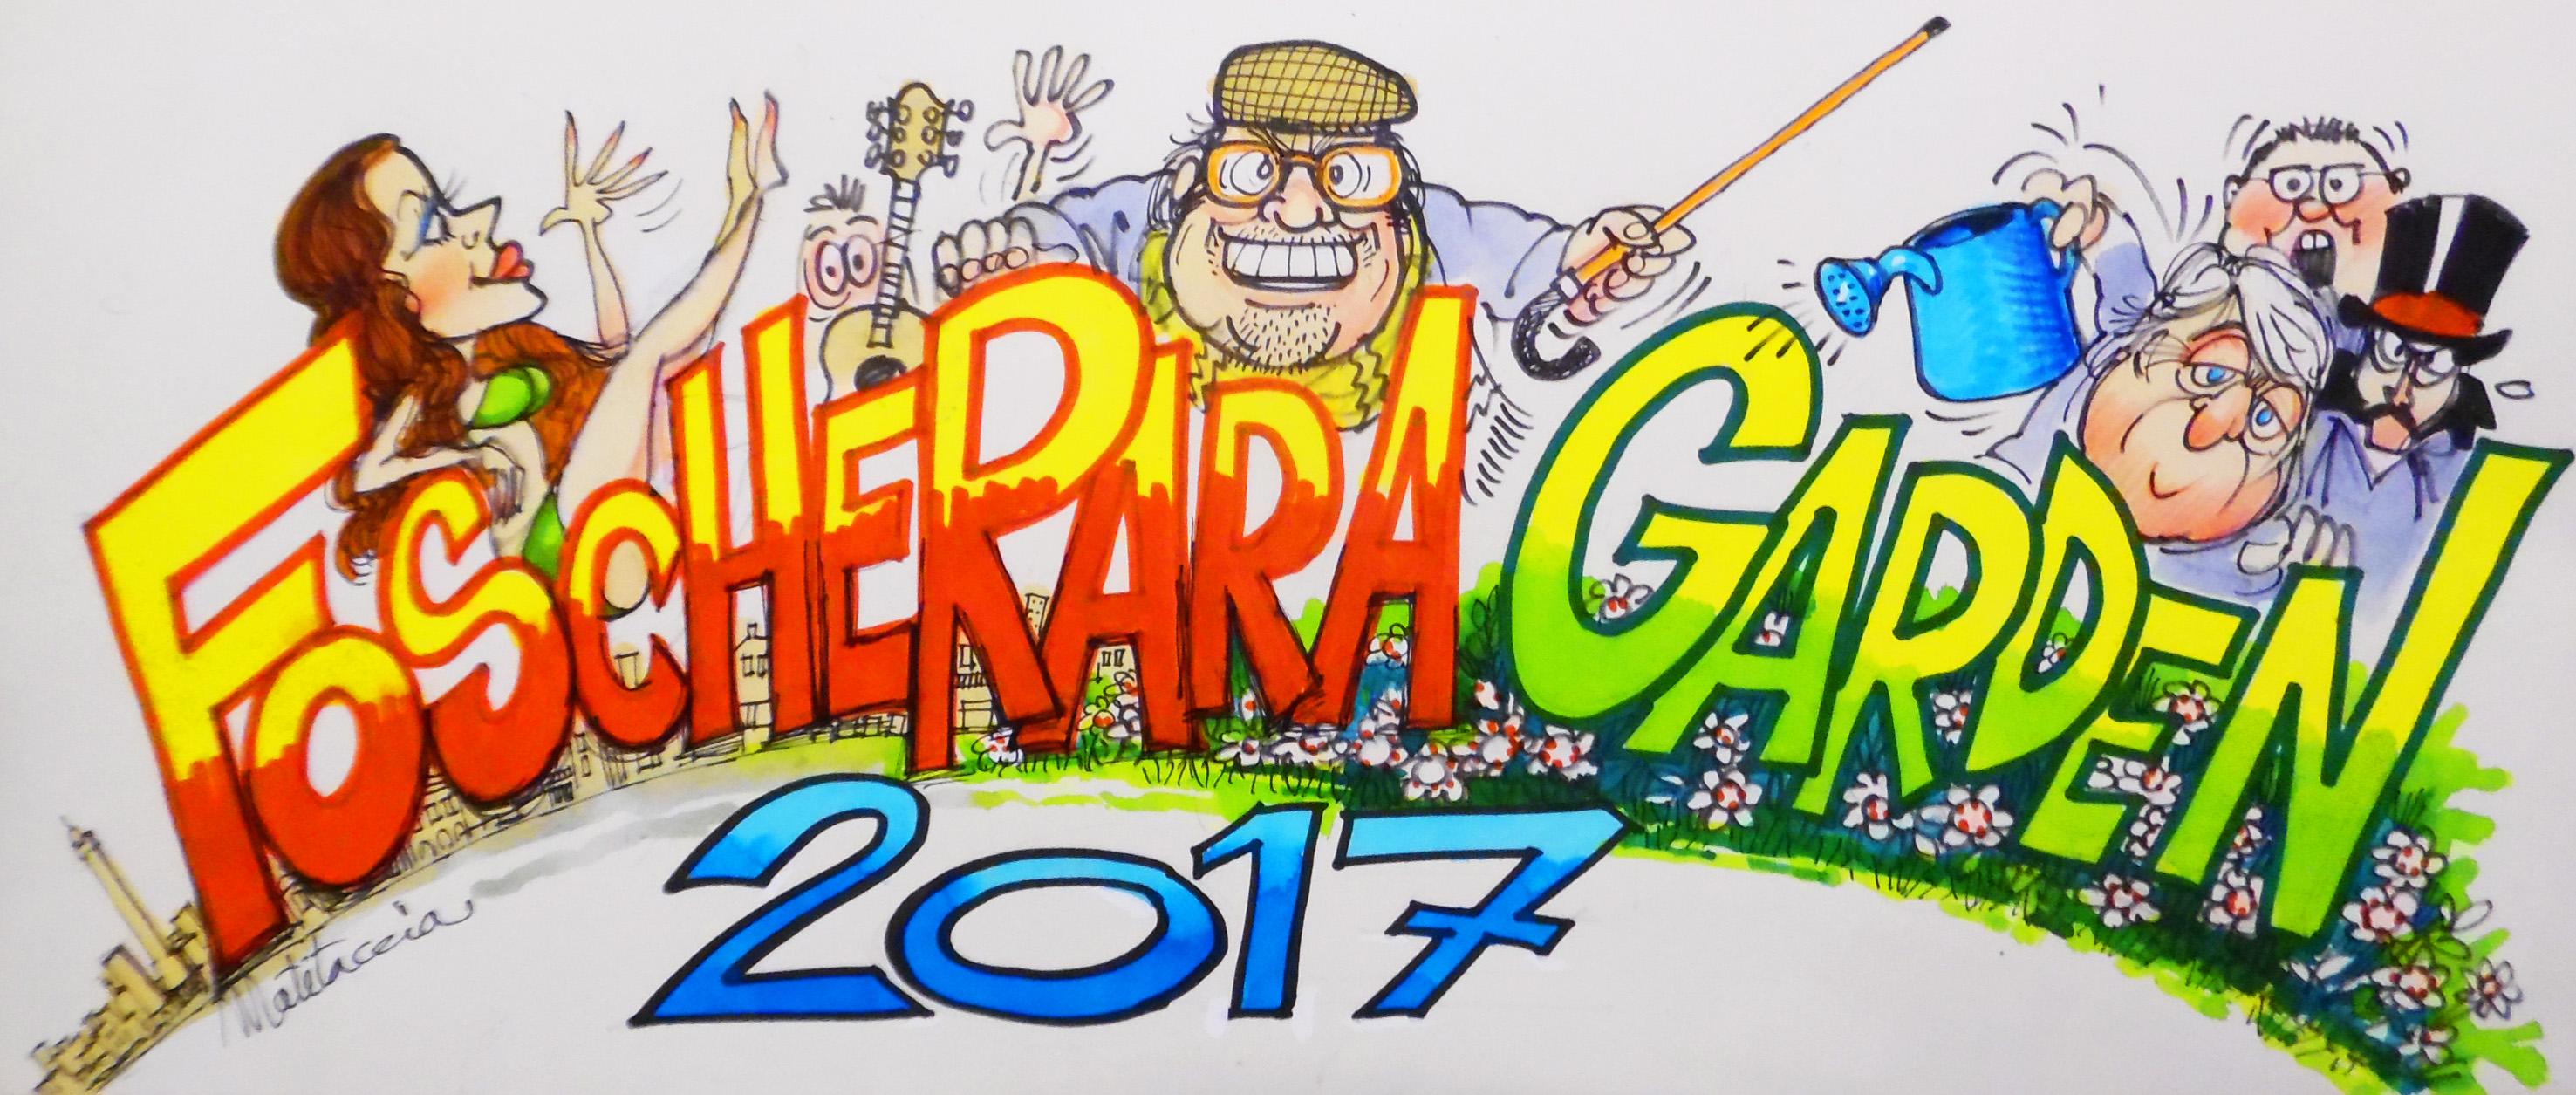 Foscherara Garden 2017 1